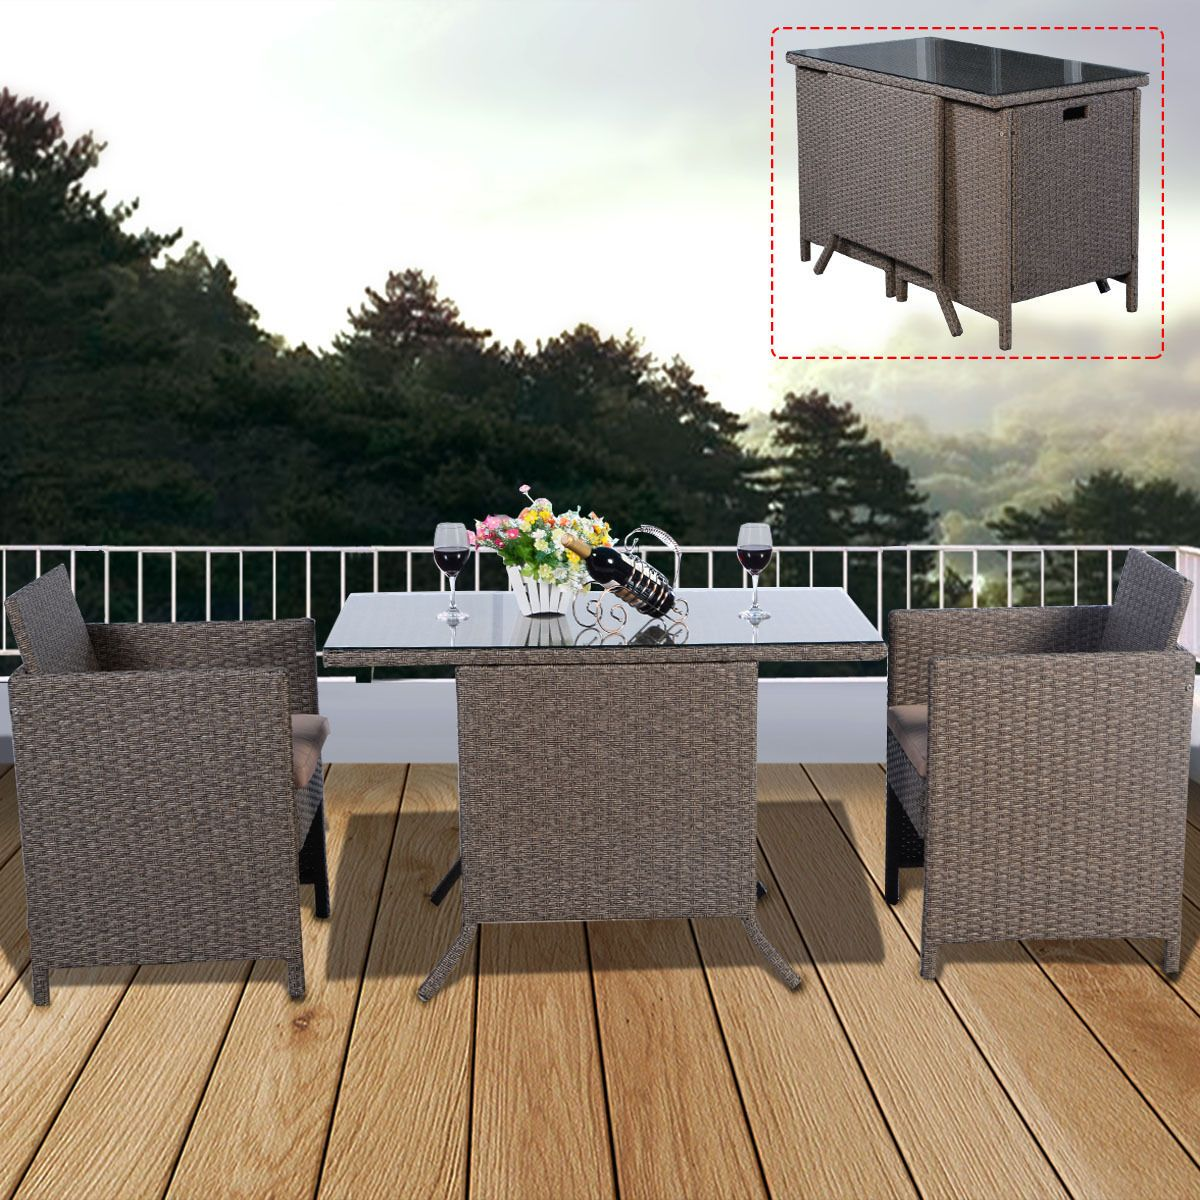 3pc Rattan Garden Bistro Set Cafe Tea Breakfast Chair Table Patio Cushions